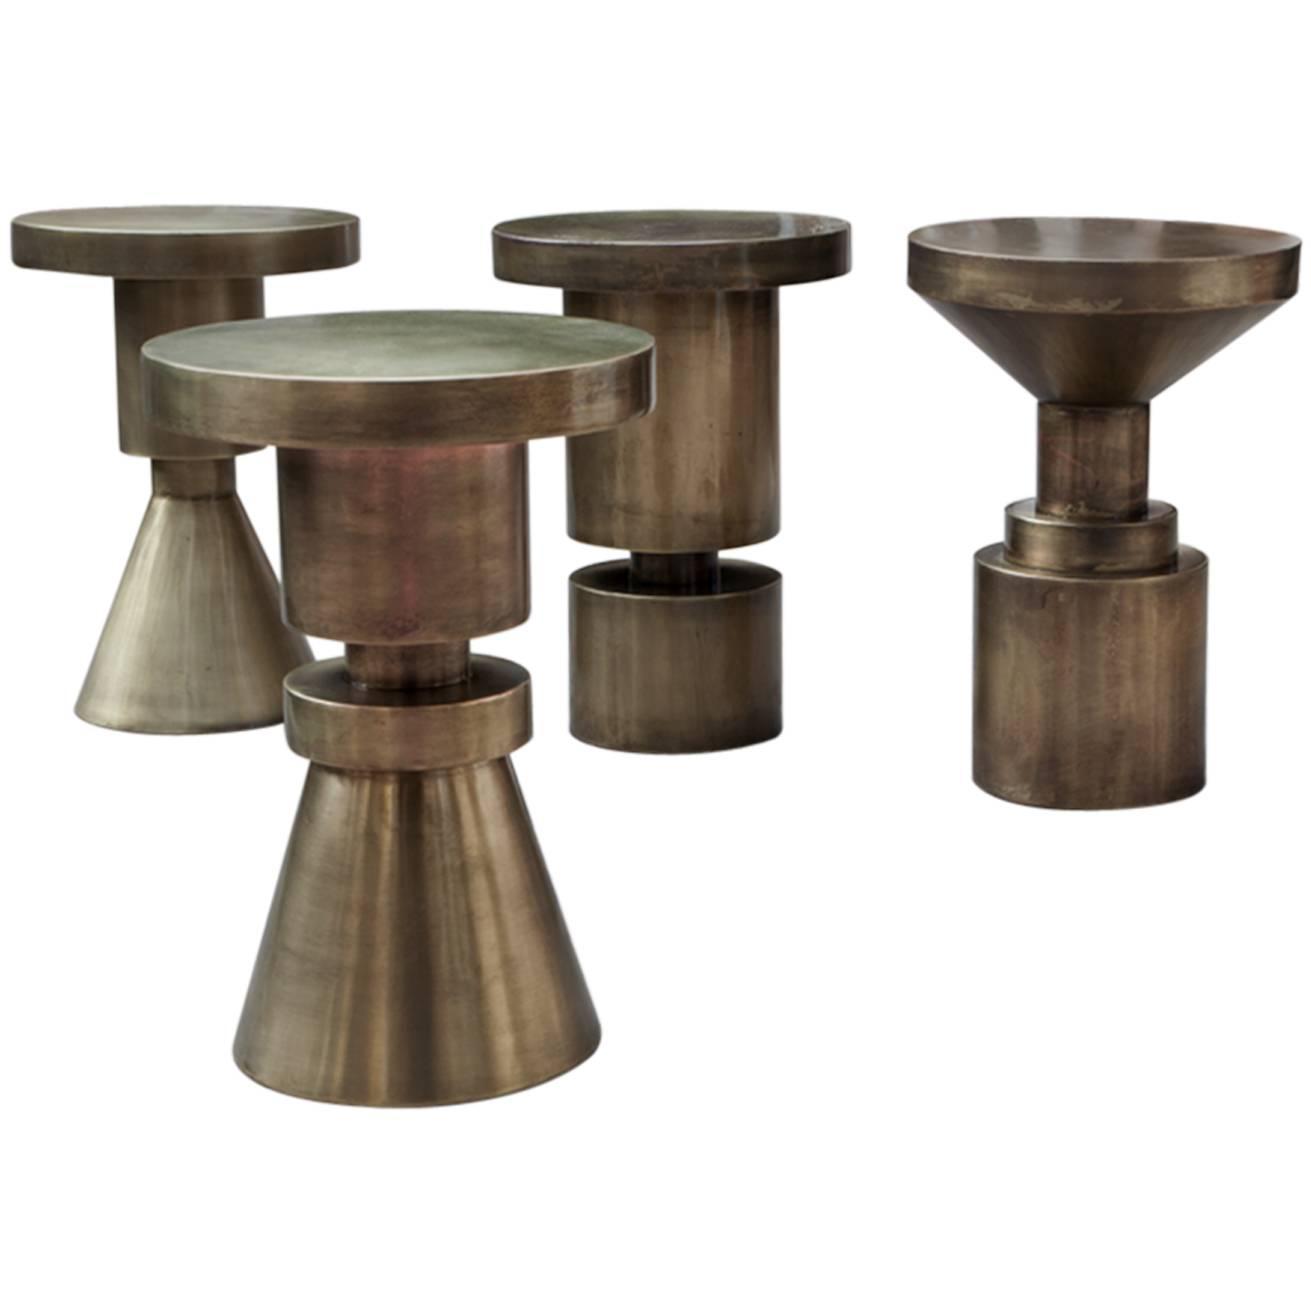 Anna Karlin chess stools, 2016